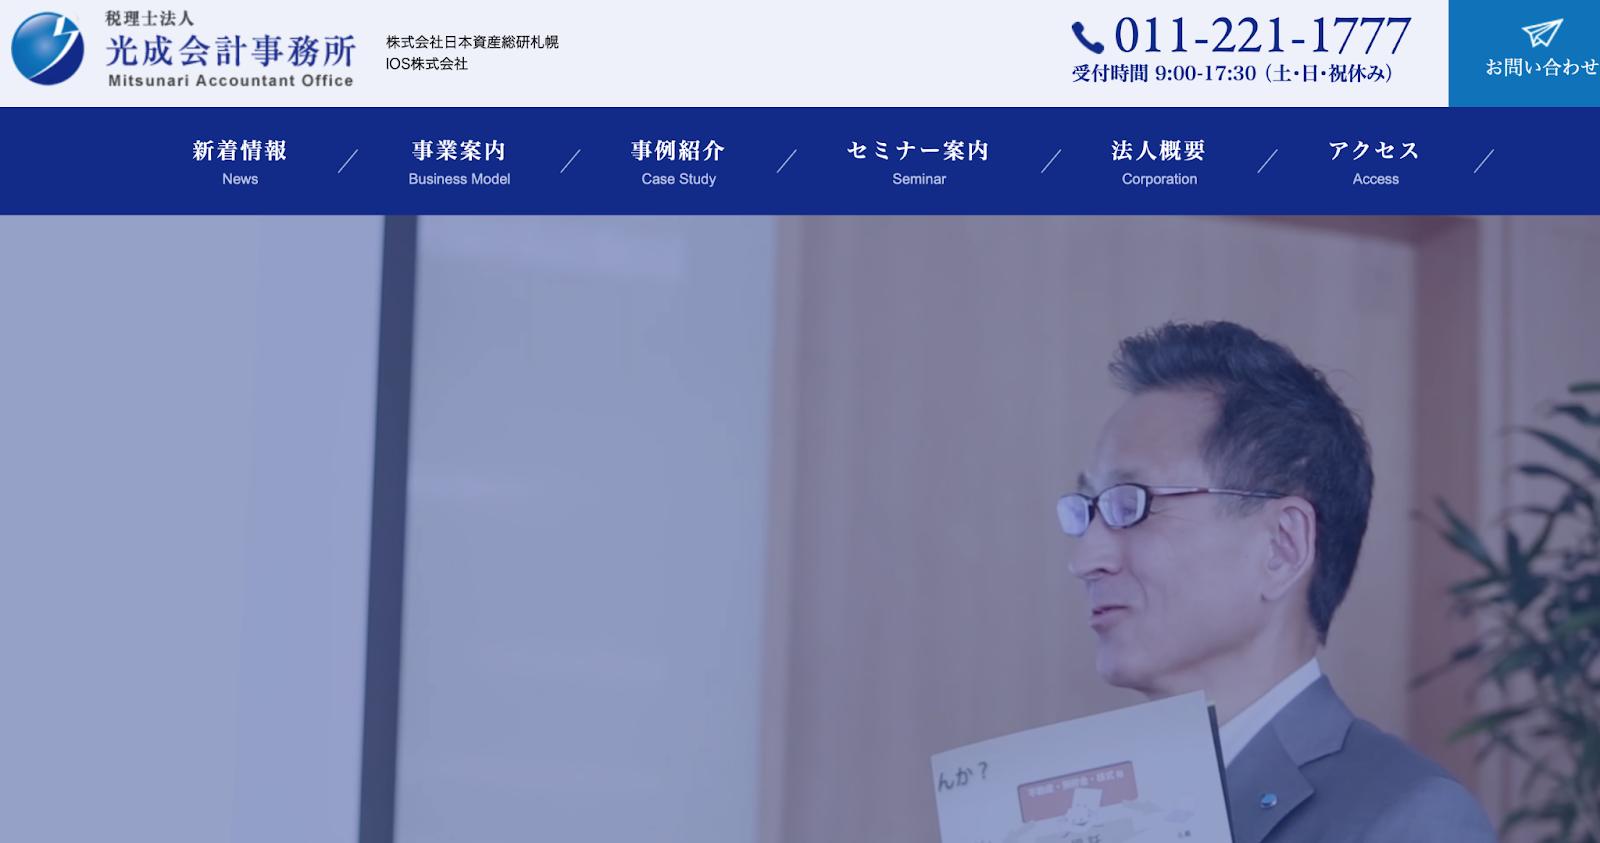 1.札幌地下歩行空間から徒歩0分 税理法人光成会計事務所